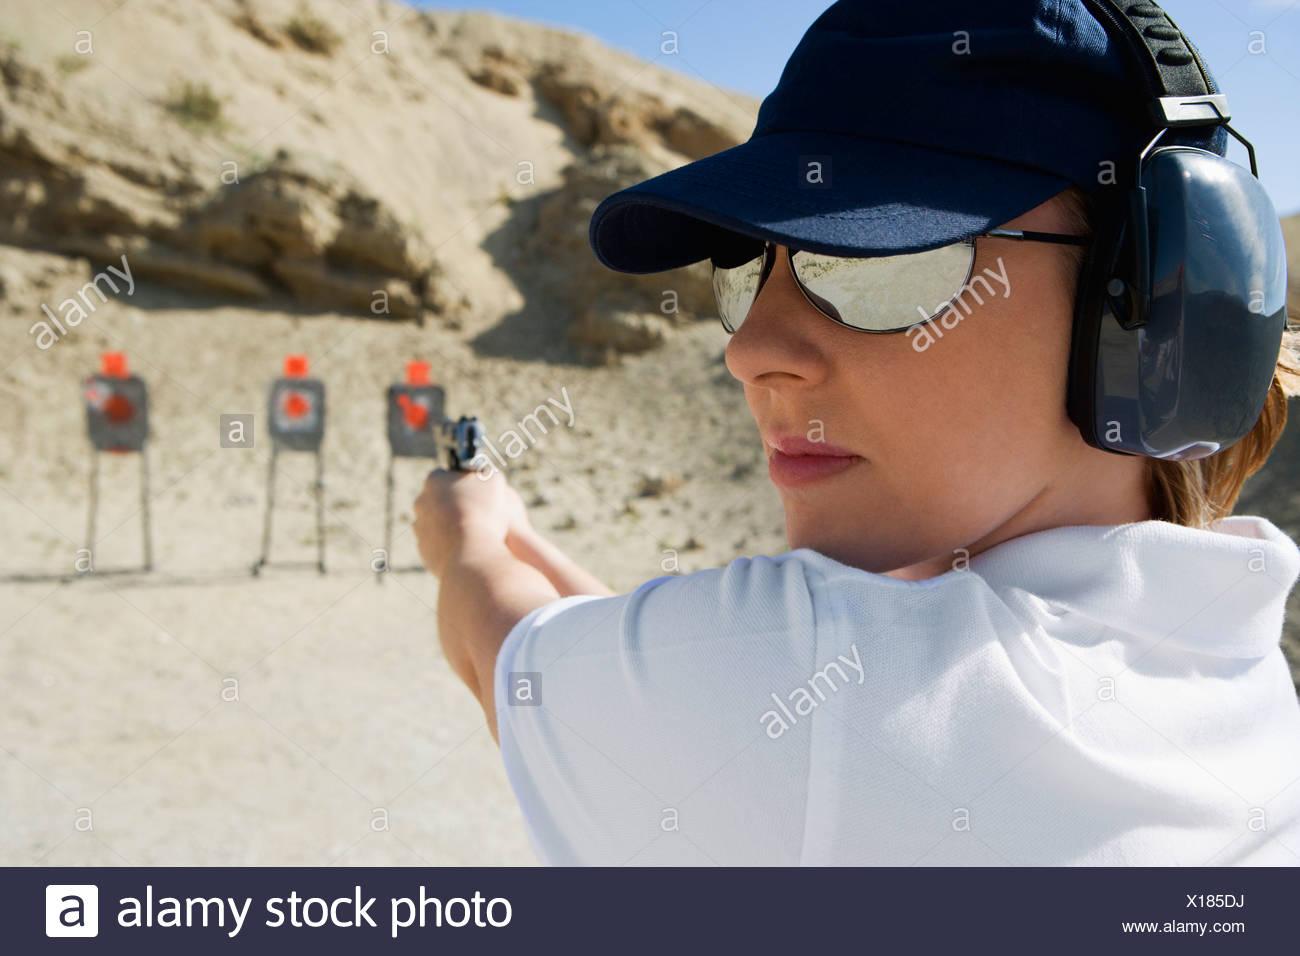 Woan aiming hand gun at firing range - Stock Image